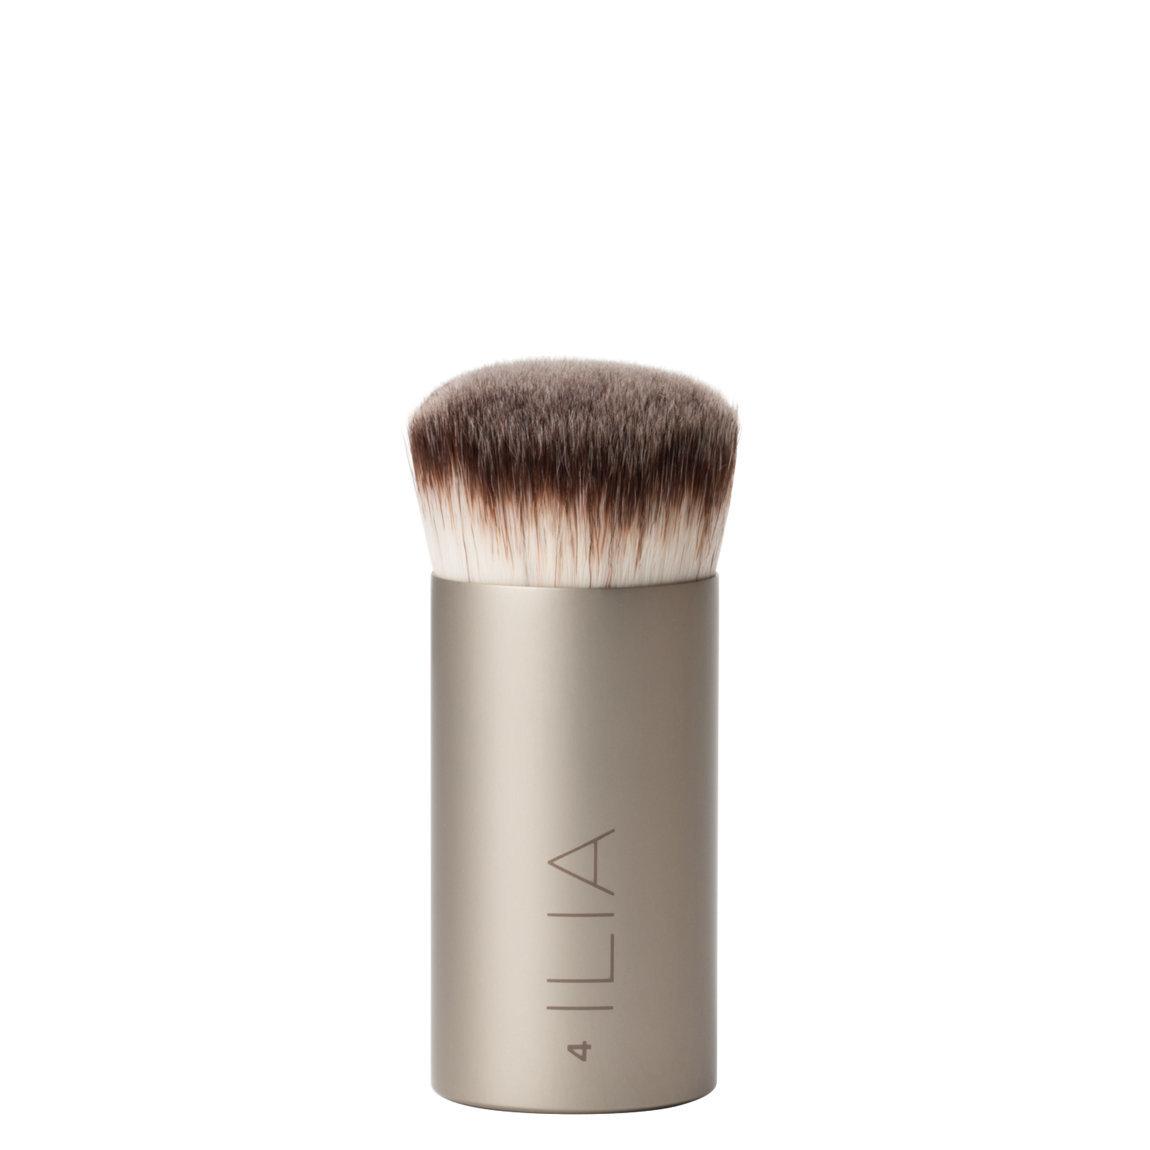 ILIA Perfecting Buff Brush product swatch.